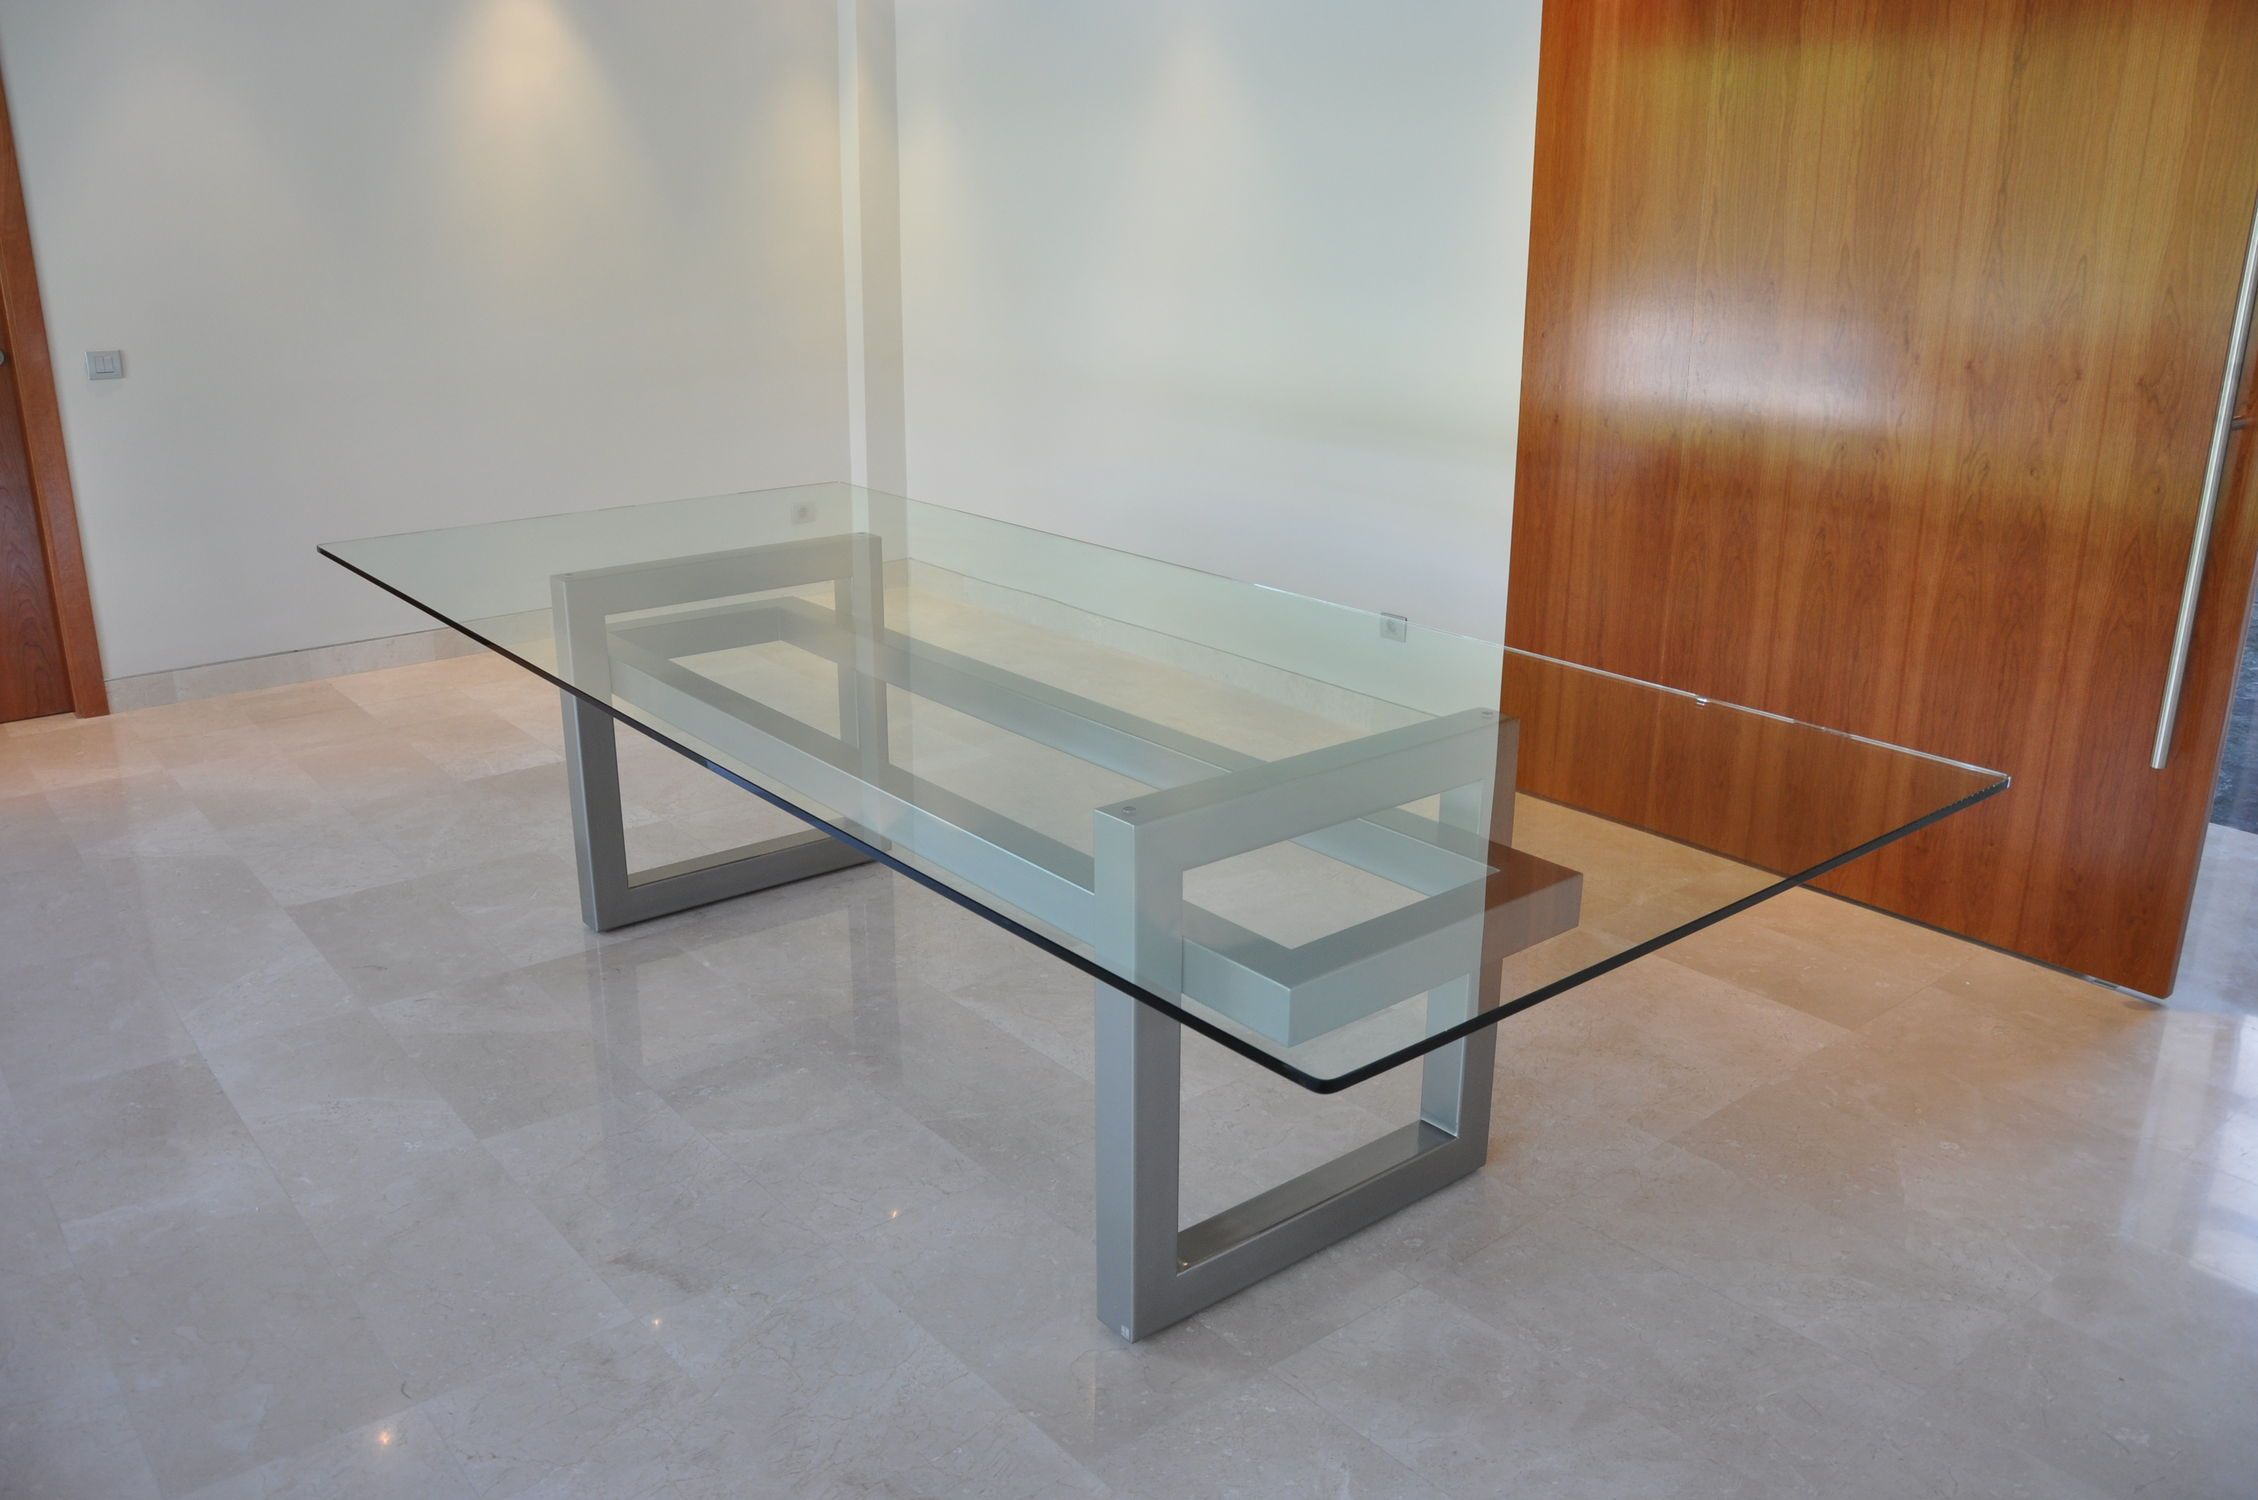 Mesa de reuniones moderna de cristal de hierro diana - Mesas modernas de cristal ...